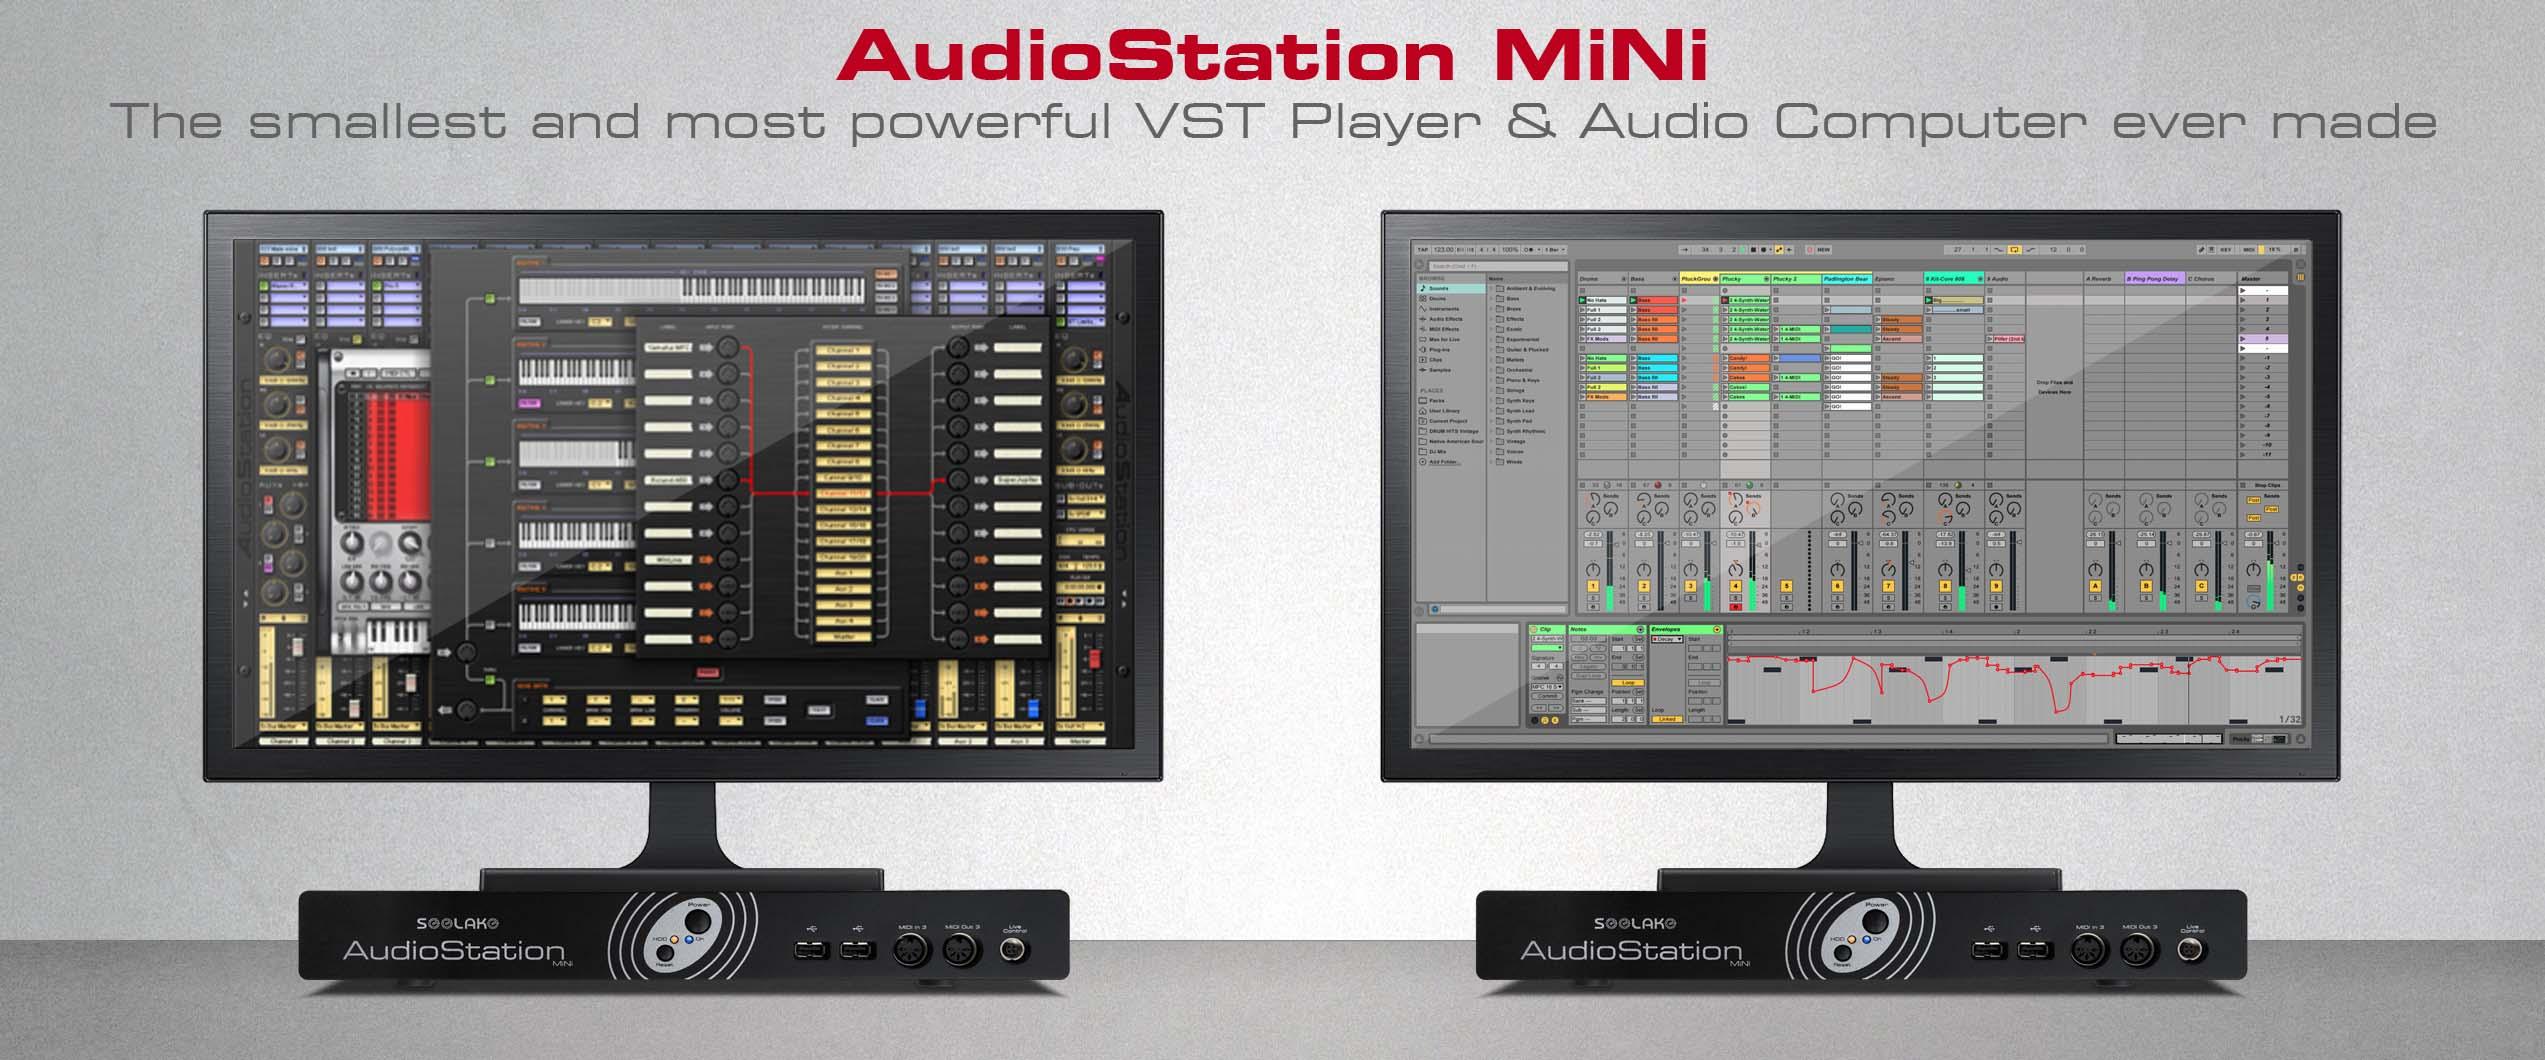 Seelake - AudioStation AudioPlayer